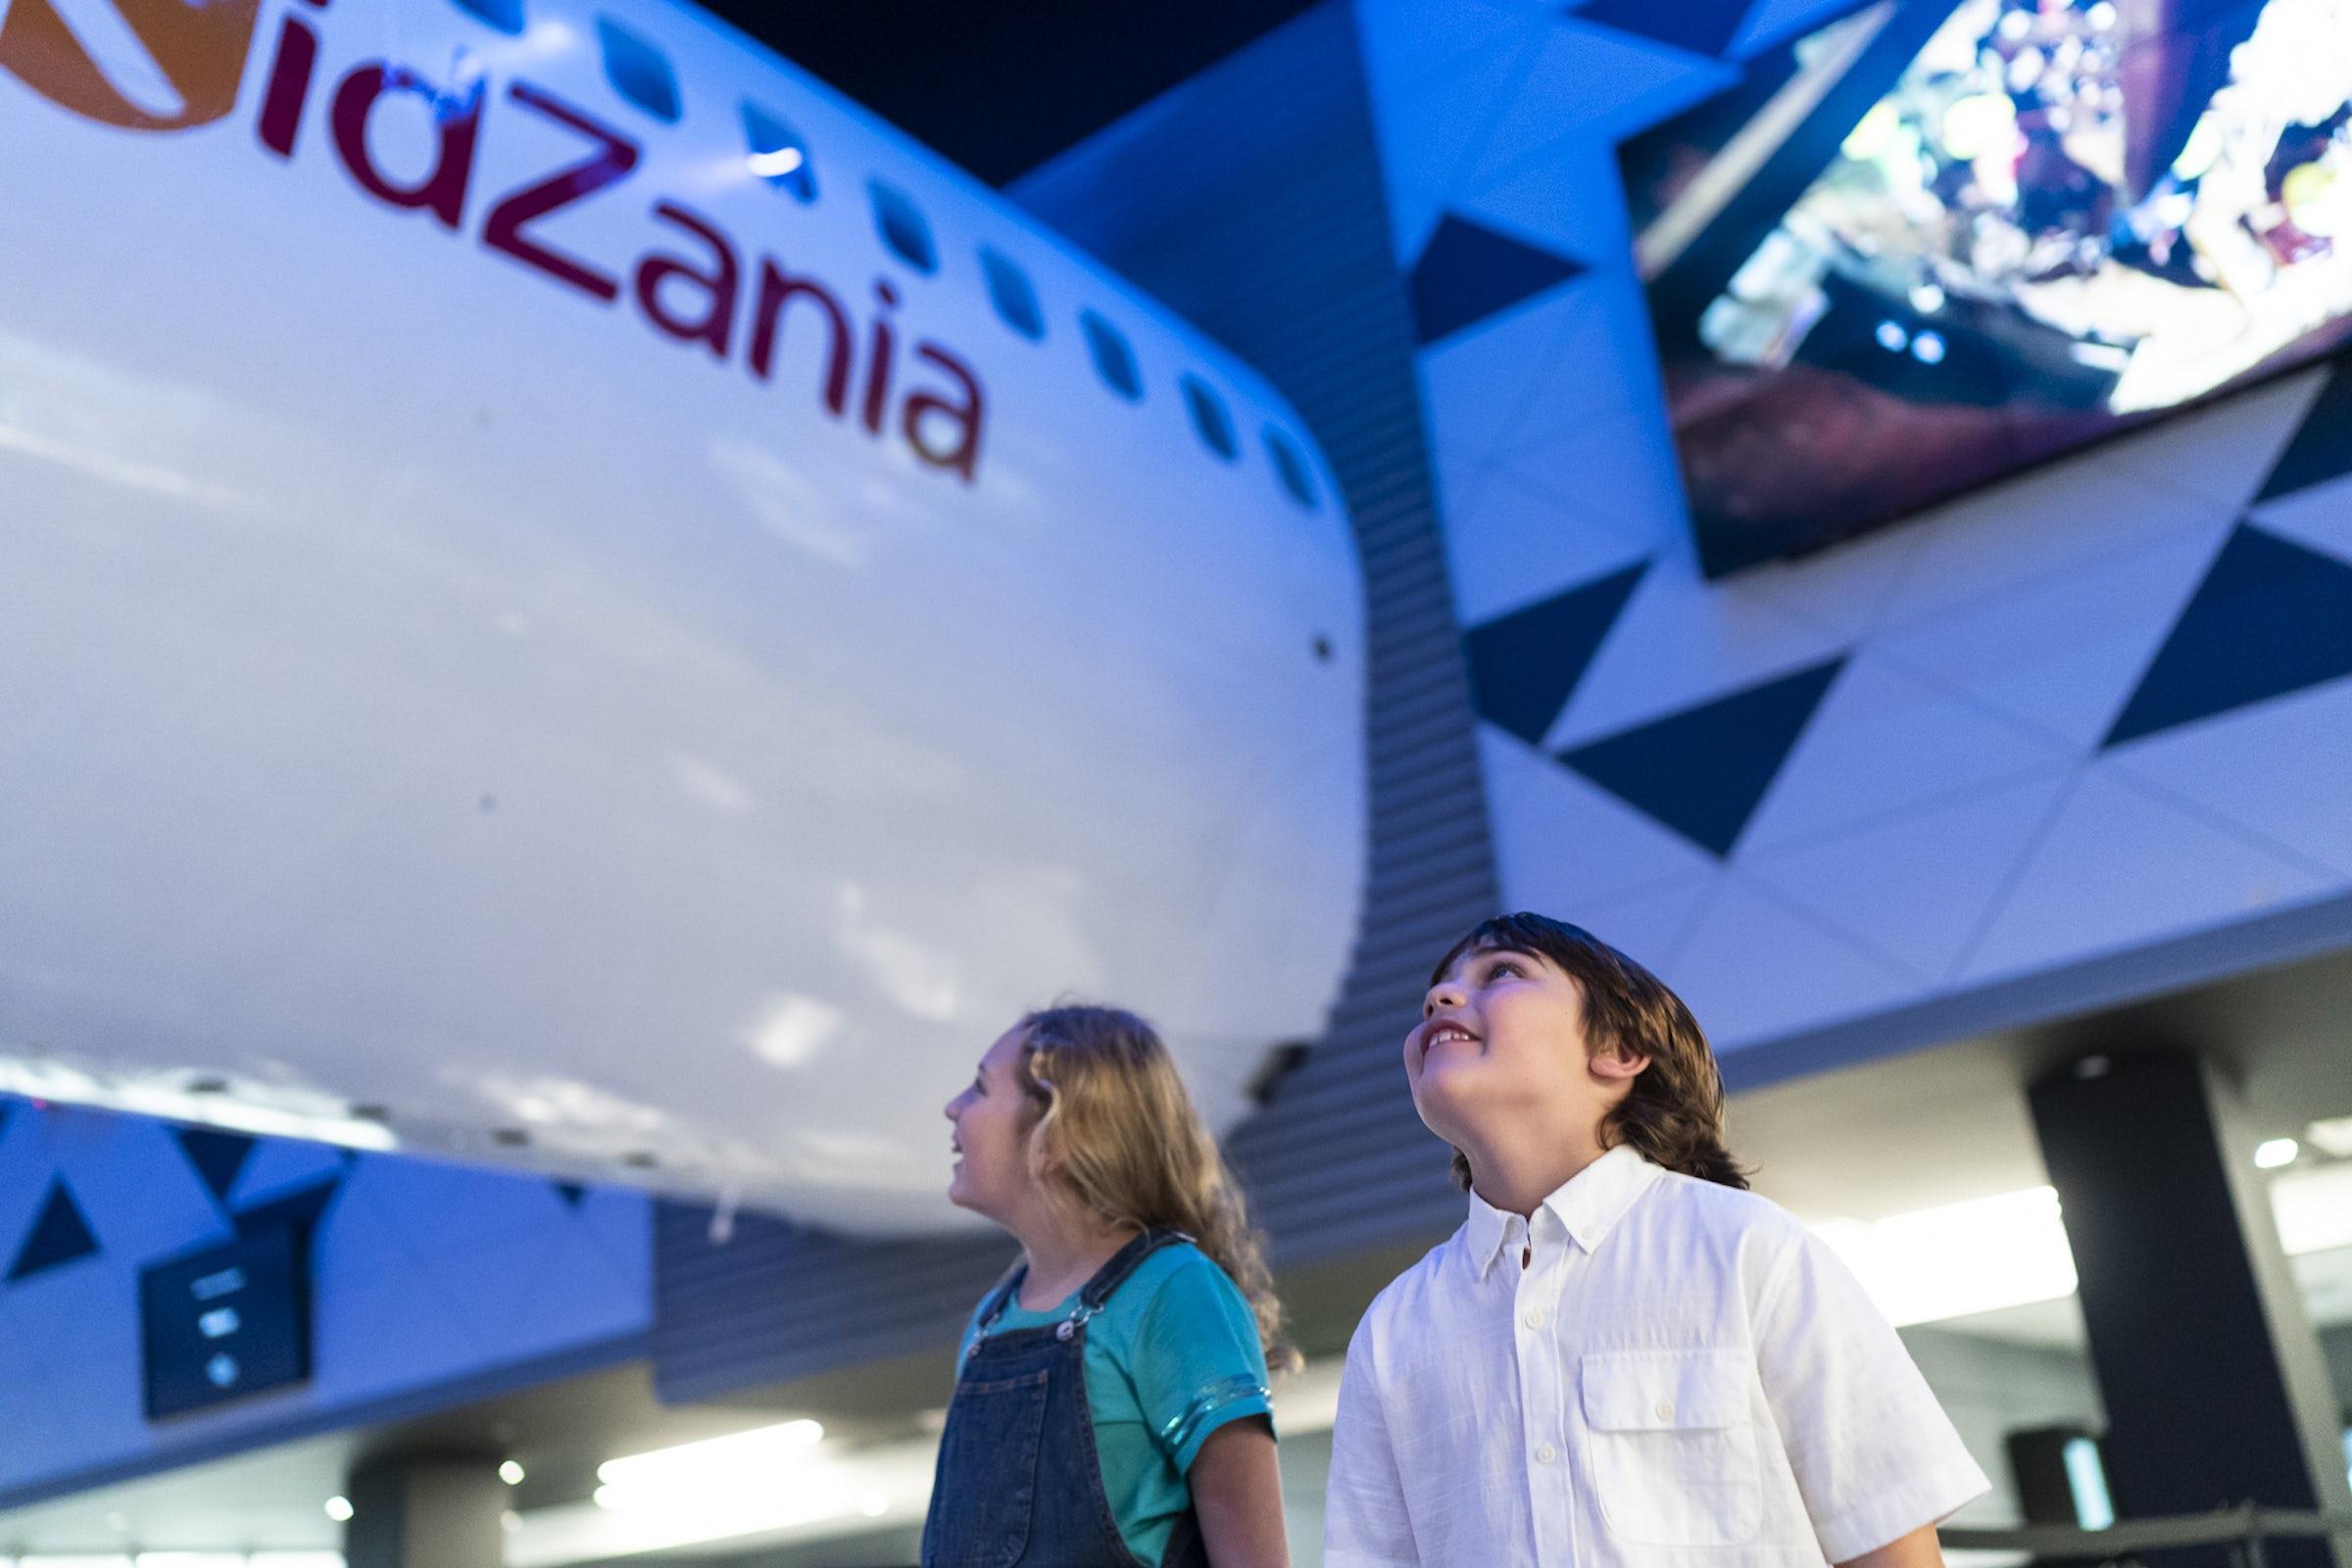 KidZania in Beyond Dallas